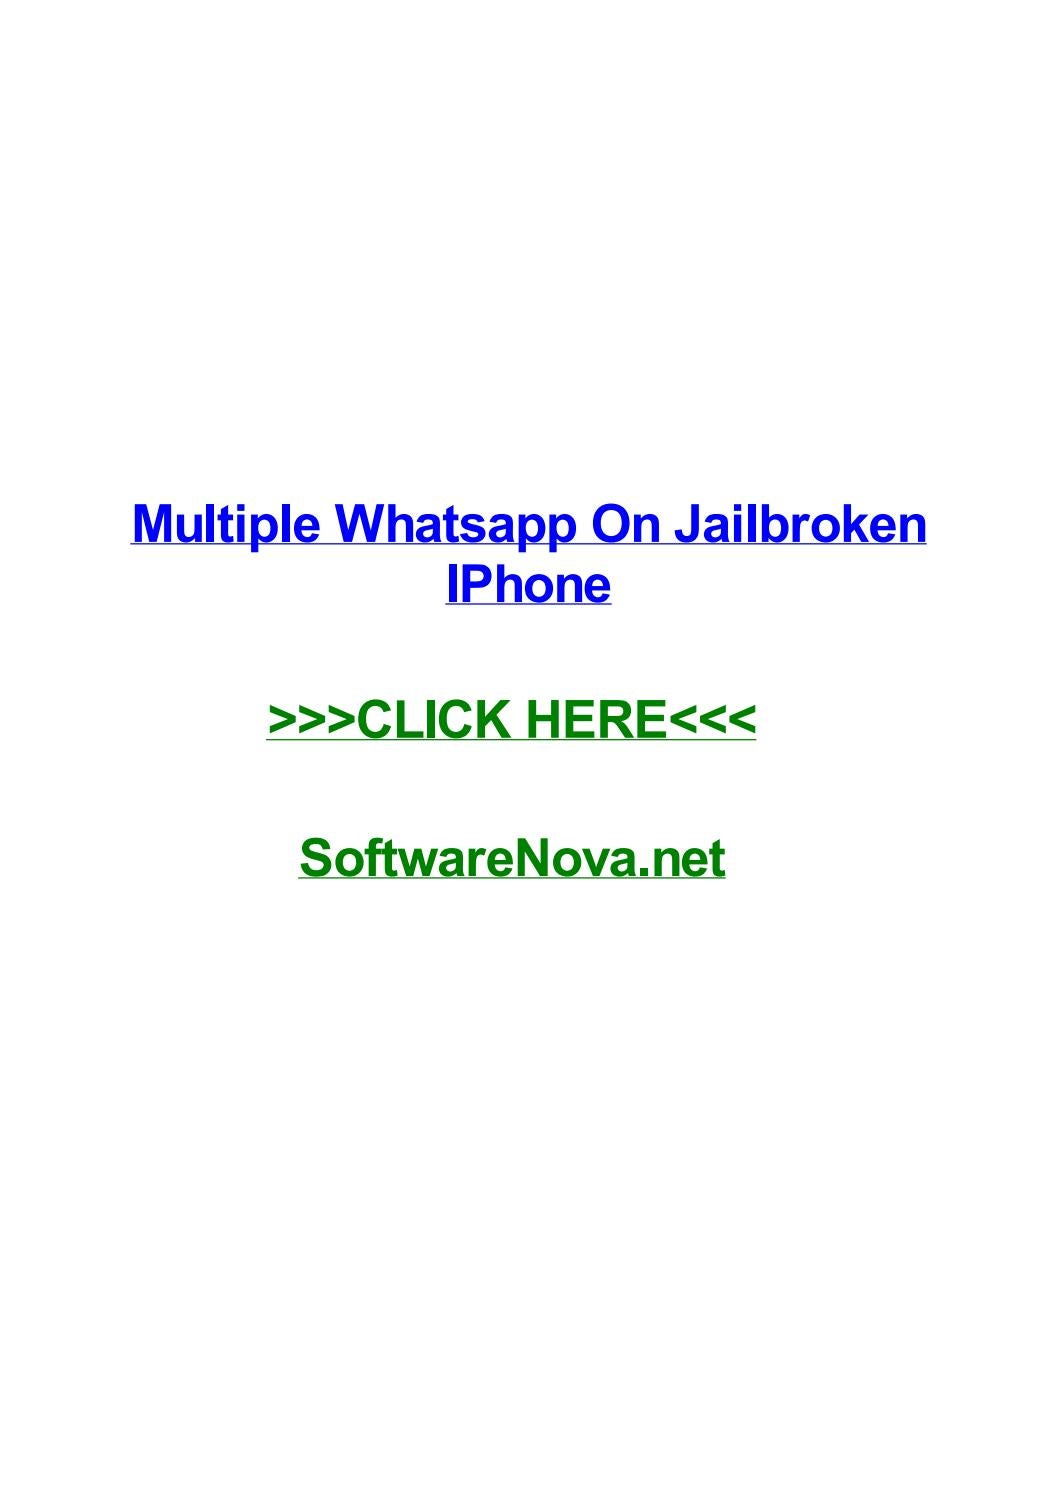 Multiple Whatsapp On Jailbroken Iphone By Amymczp Issuu